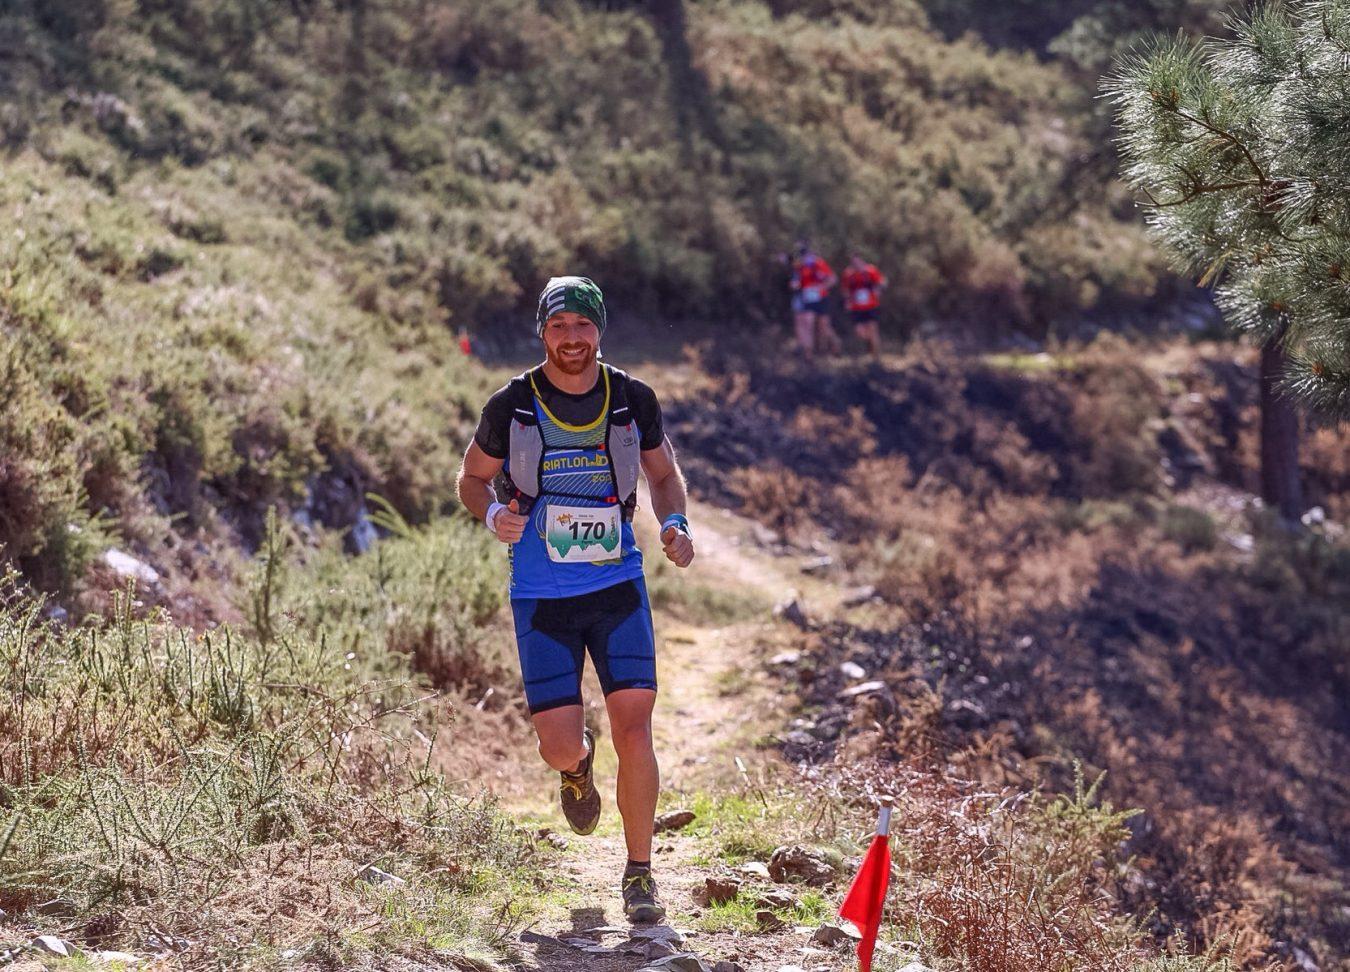 Cristopher Fernández gana en la distancia corta de la 27 Kangas Mountain